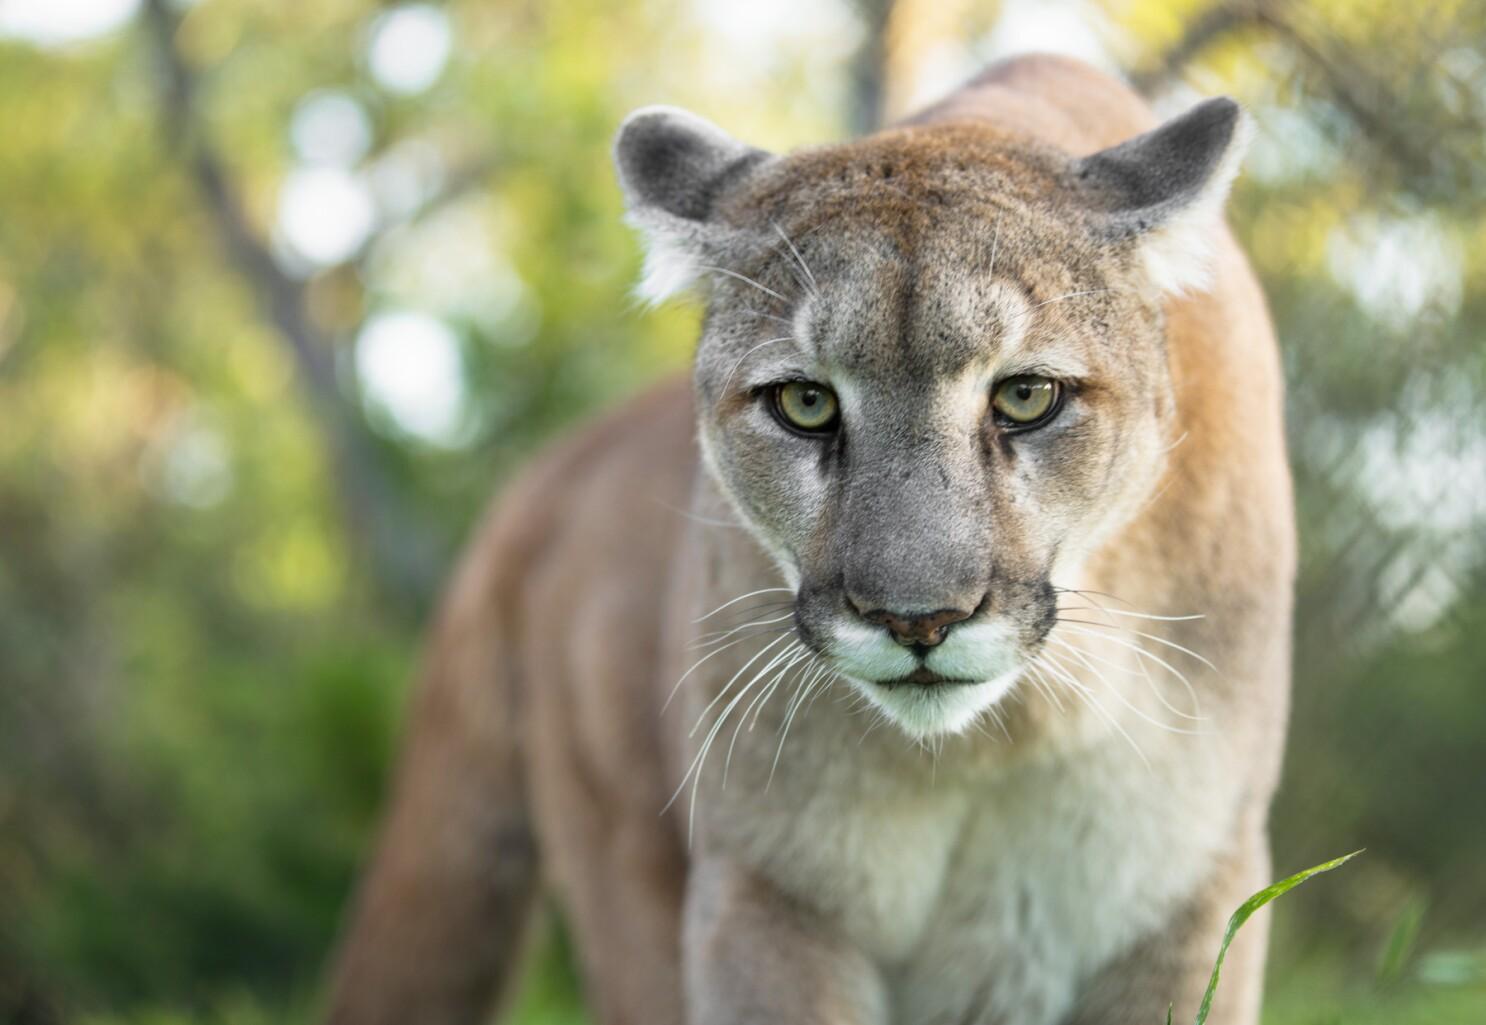 Mountain lion found, killed after Blue Sky attack - Pomerado News